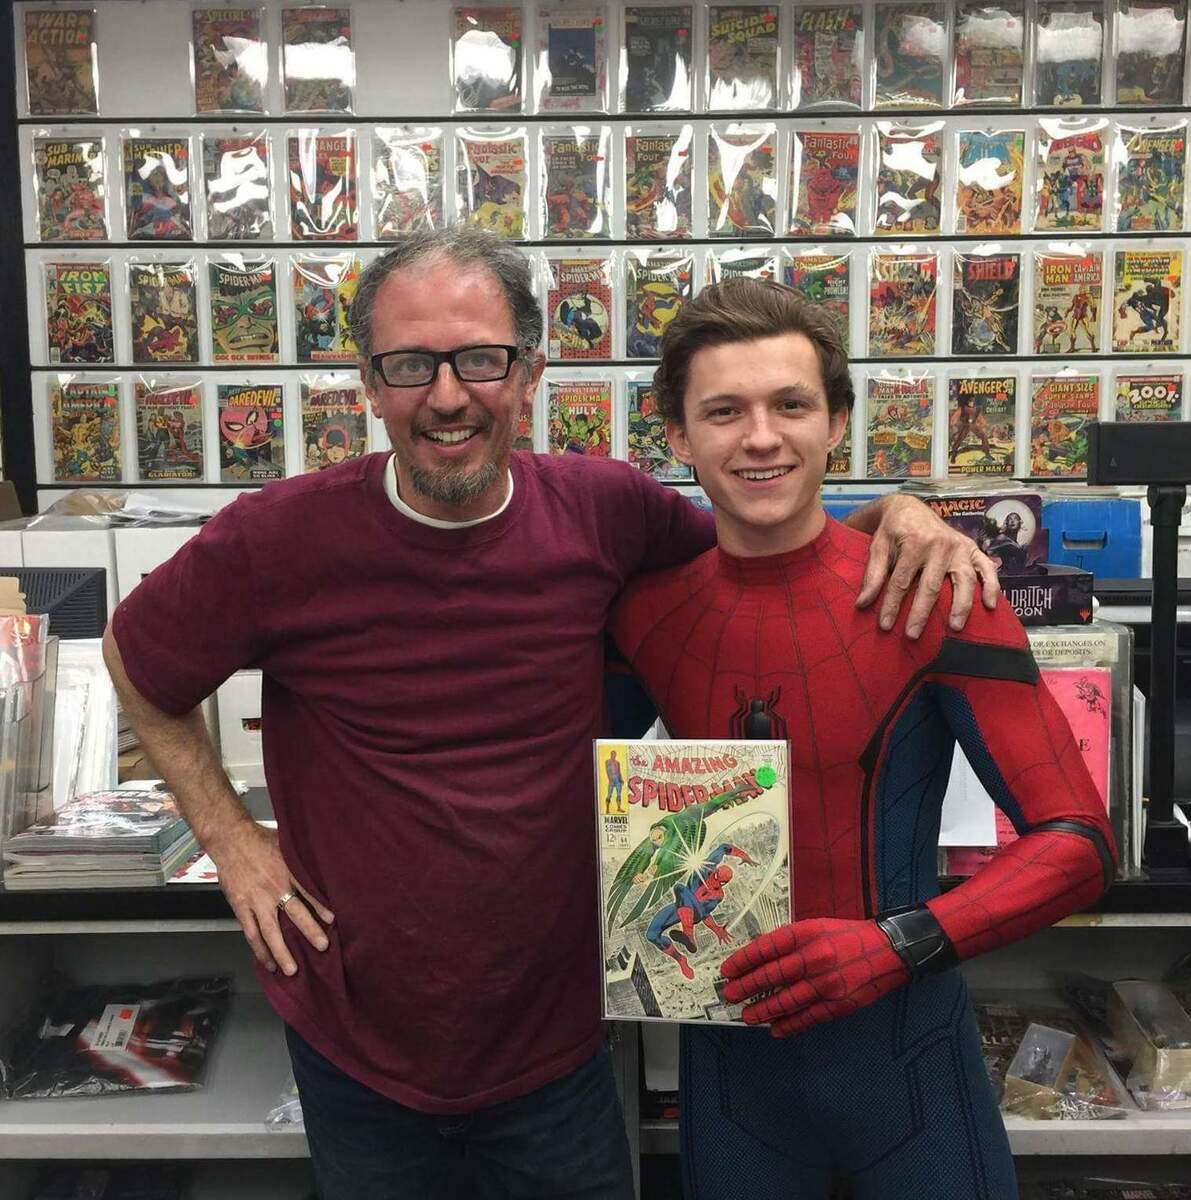 Silver Age Comics NYC